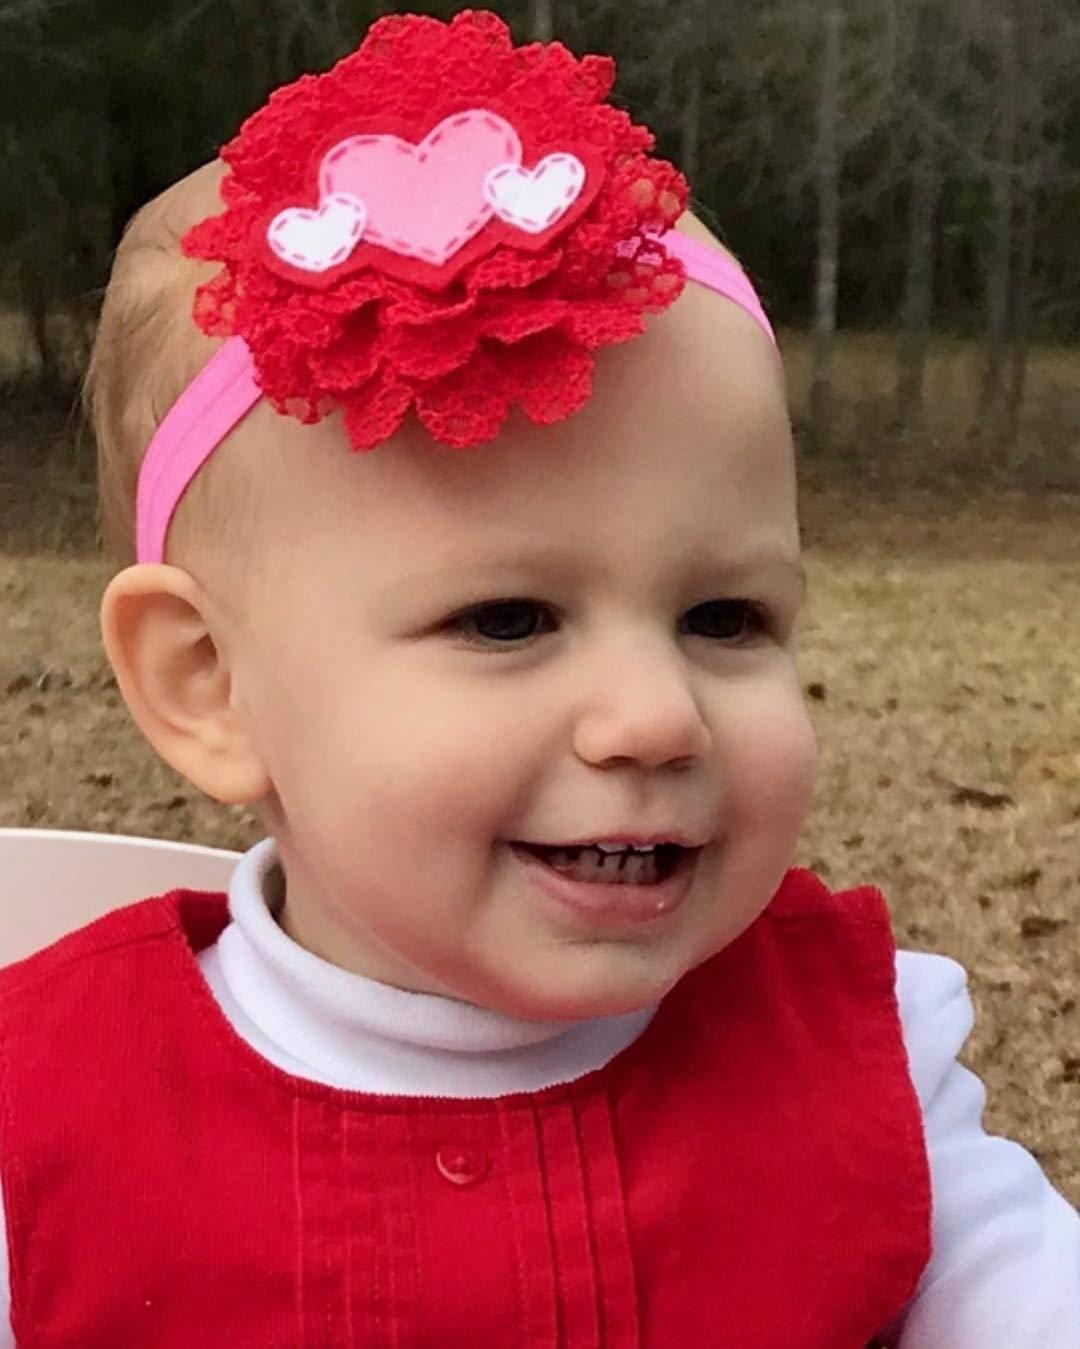 baby girl valentine\u2019s day gift red baby headband baby girl gift heart baby girl headband valentine\u2019s day baby headwrap